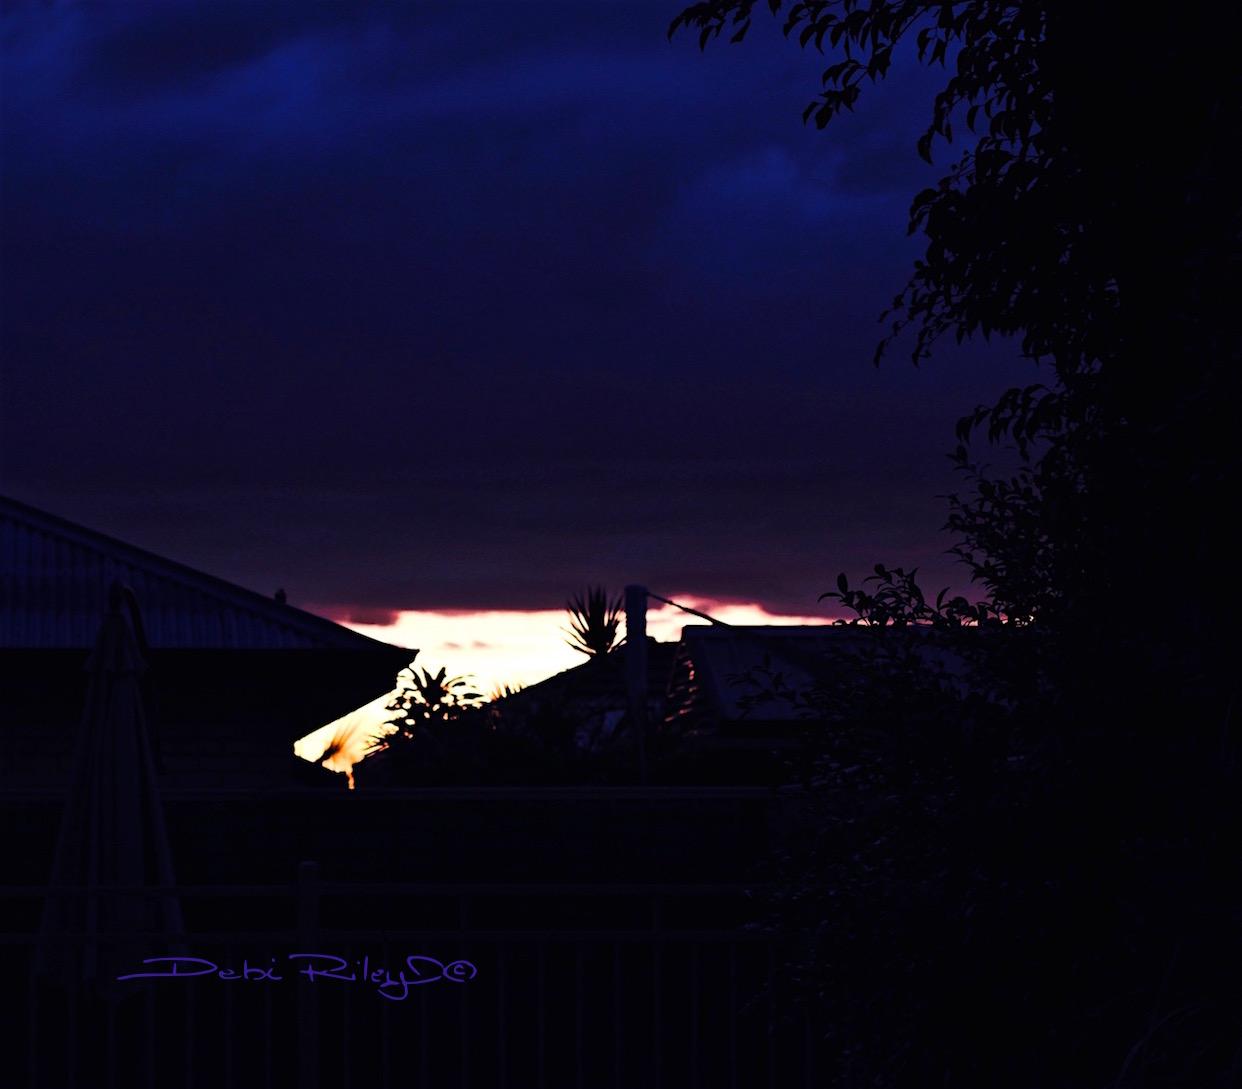 dawn sky, deepest sky darks, photo, debiriley.com